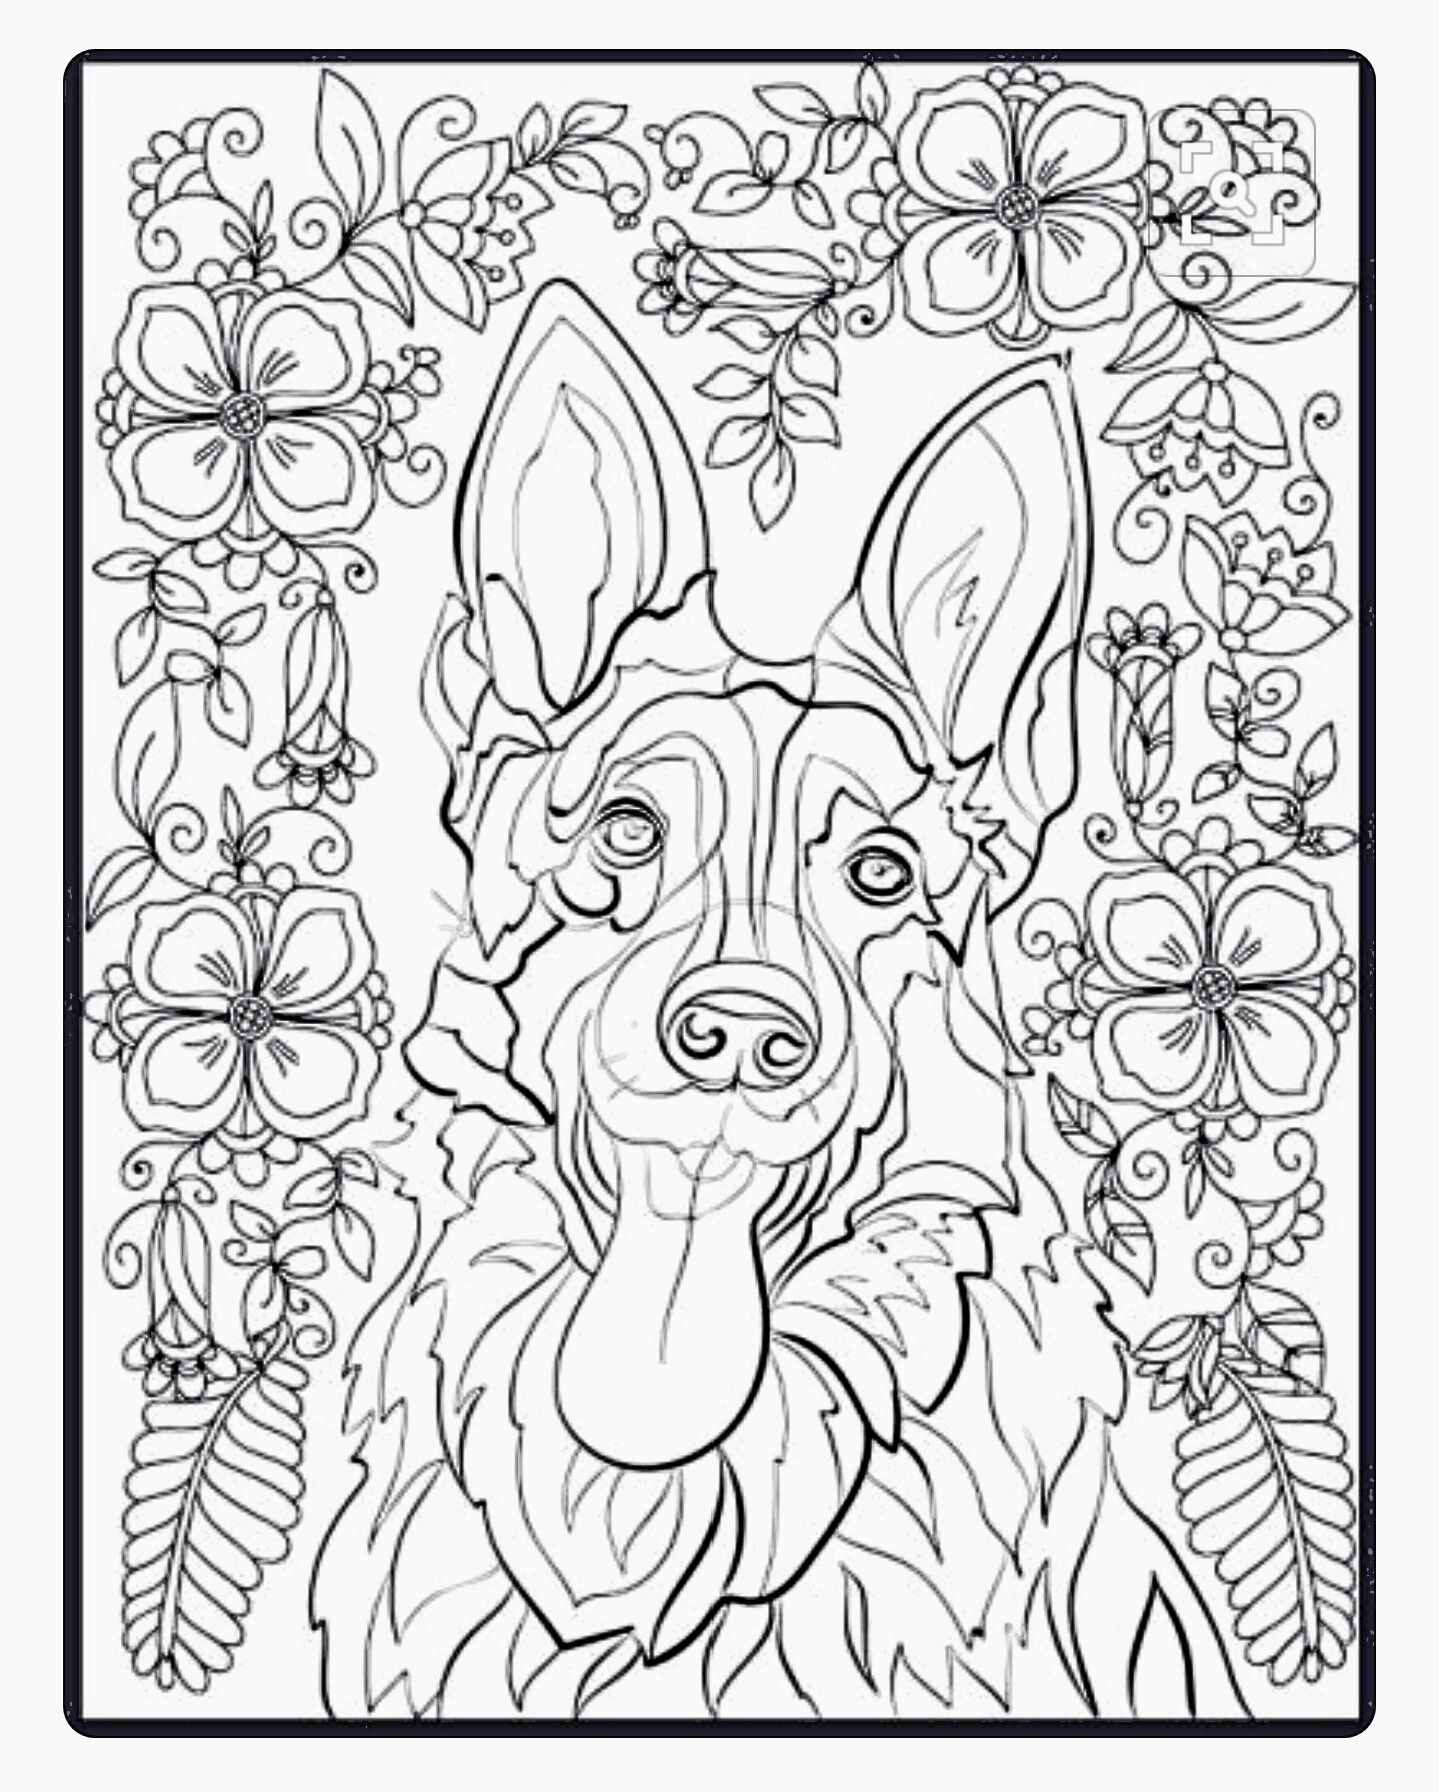 German Shepherd Coloring Page Horse Coloring Pages Animal Coloring Pages Dog Coloring Page